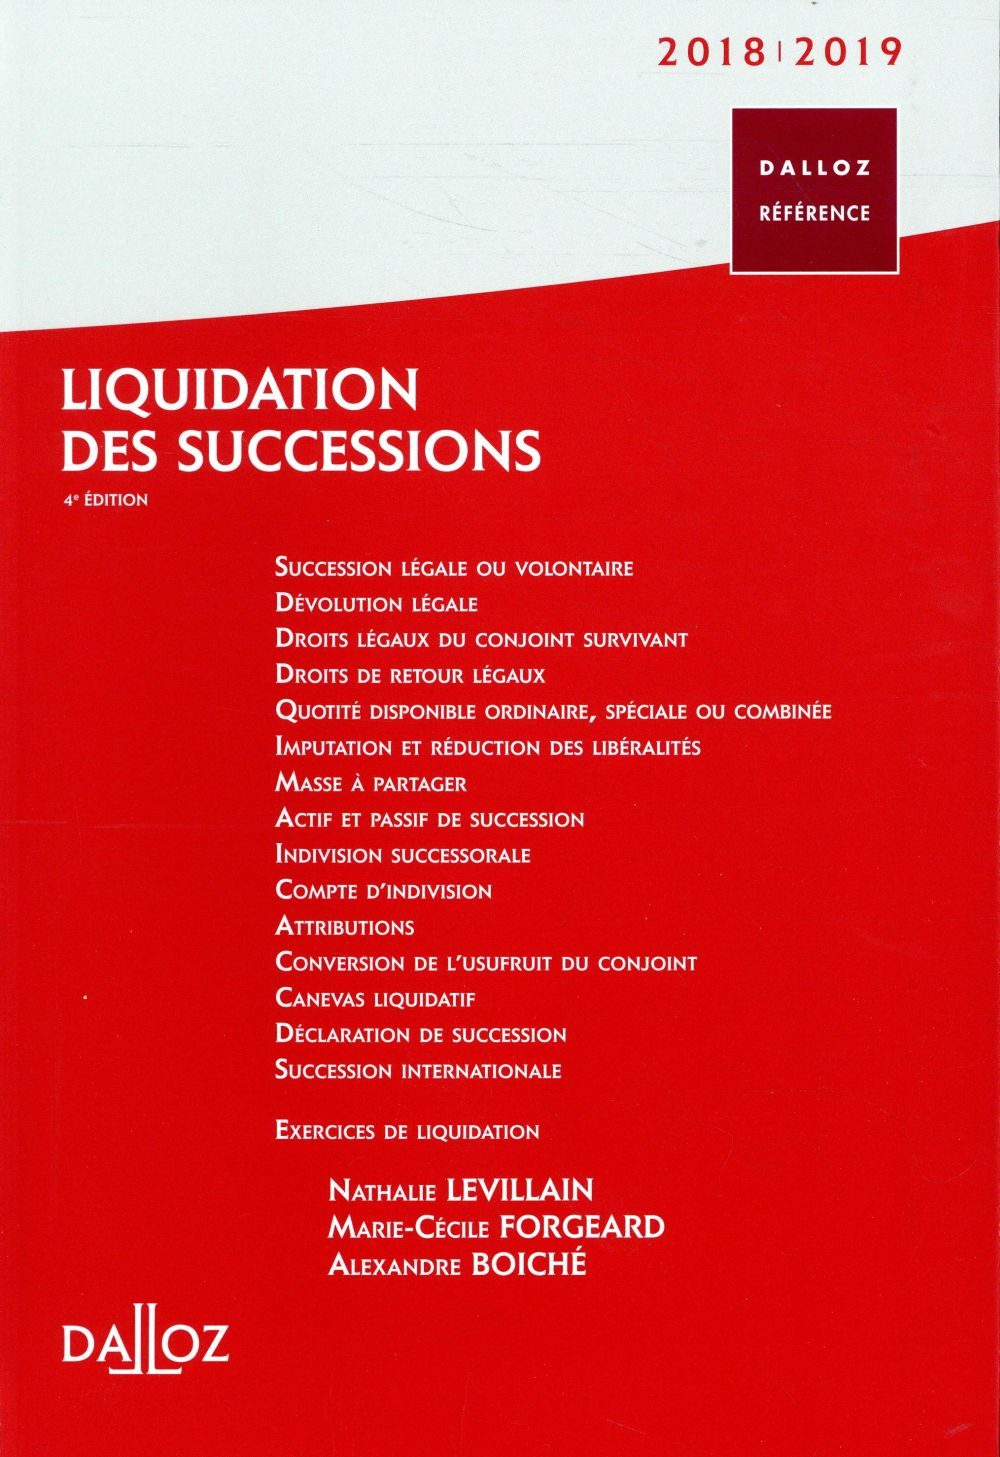 LIQUIDATION DES SUCCESSIONS 201819 - 4E ED.